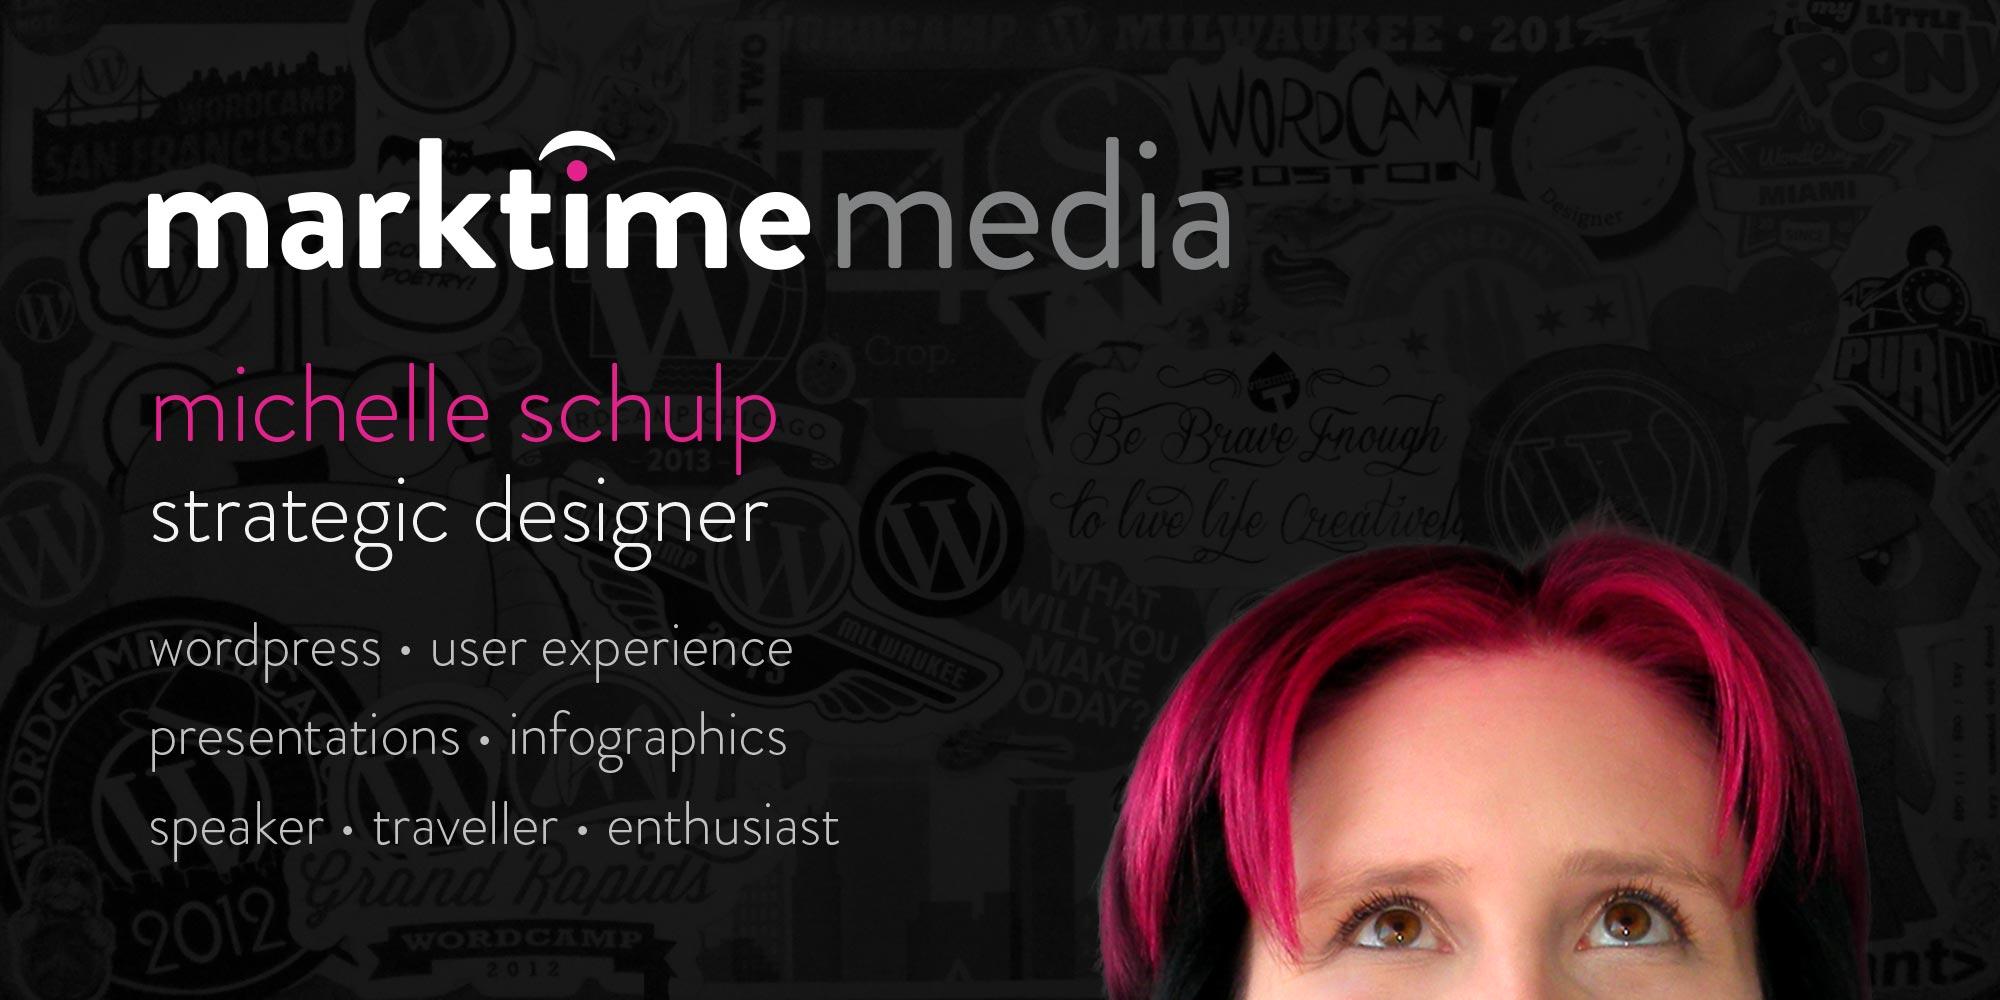 Graphic Design Jobs Minneapolis Mn: I Make Design Frictionless u2022 Marktime Mediarh:marktimemedia.com,Design